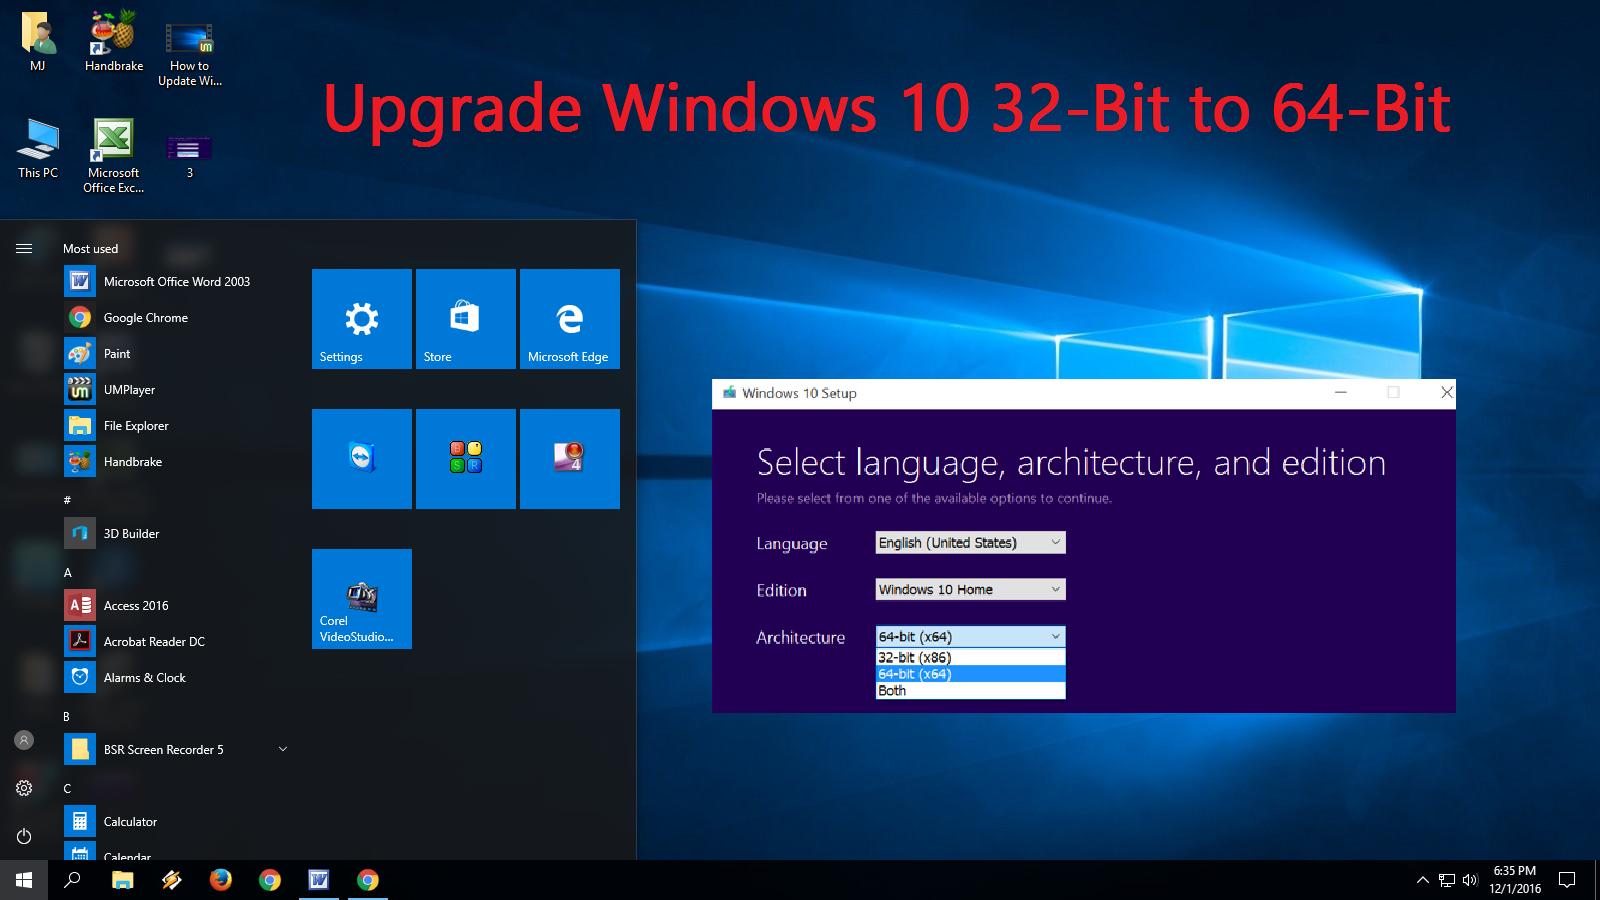 Why You Should Always Install 64-bit Windows